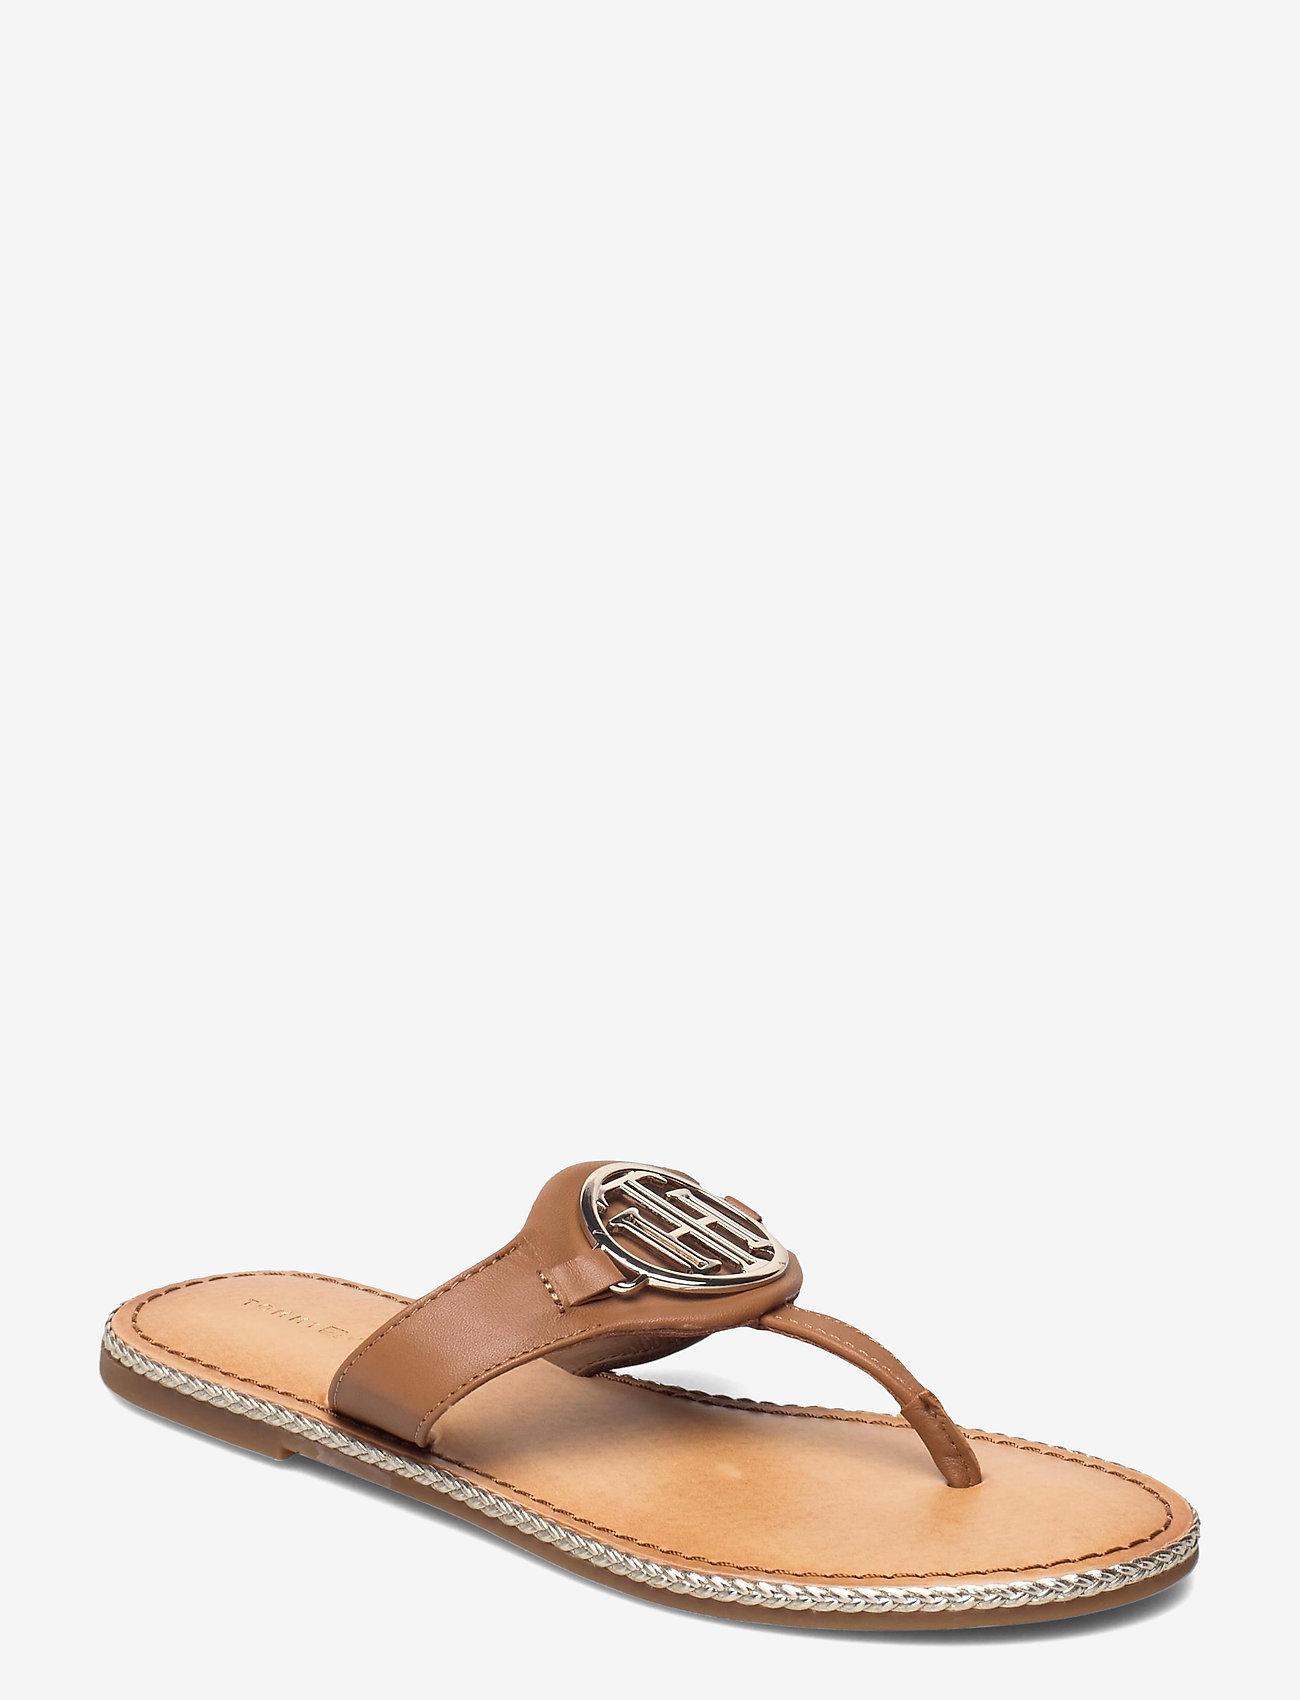 Tommy Hilfiger - ESSENTIAL LEATHER FLAT SANDAL - flat sandals - summer cognac - 0